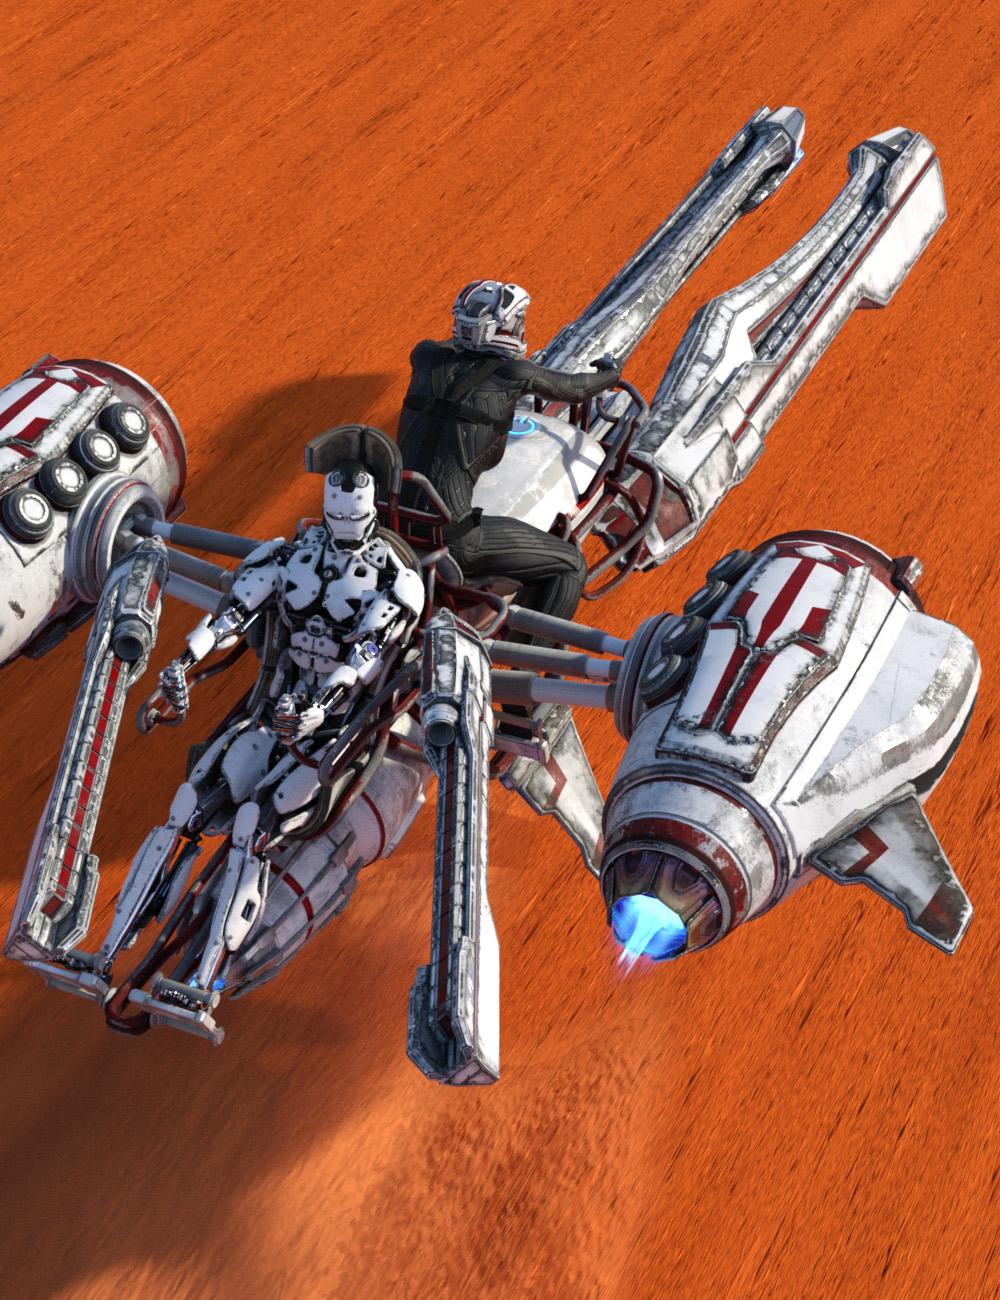 ATVE Mods - Janus and Desert Coyote by: Kara Pitat, 3D Models by Daz 3D